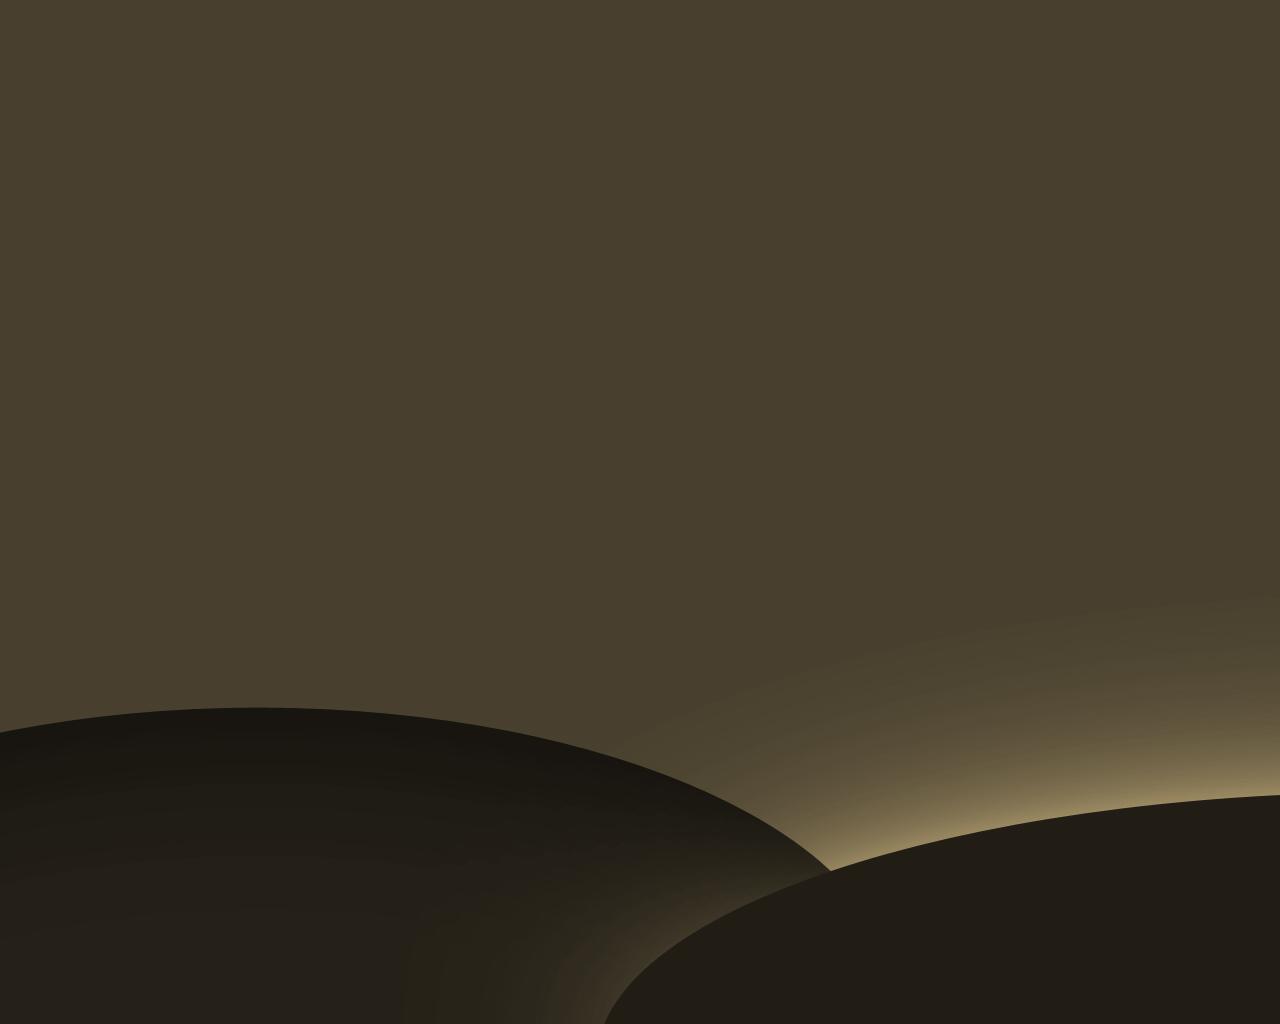 Simple Backgrounds by jamesxv7 on DeviantArt